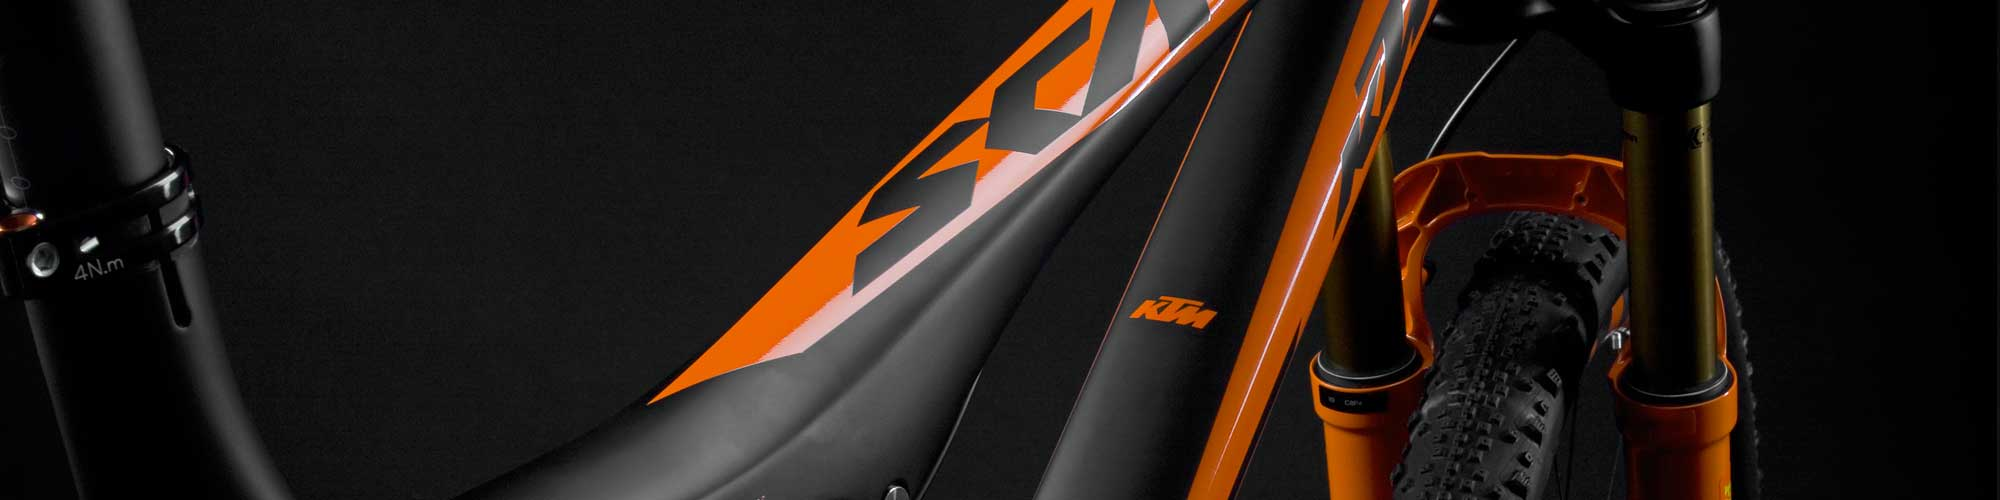 Rowery KTM 2017 promocja